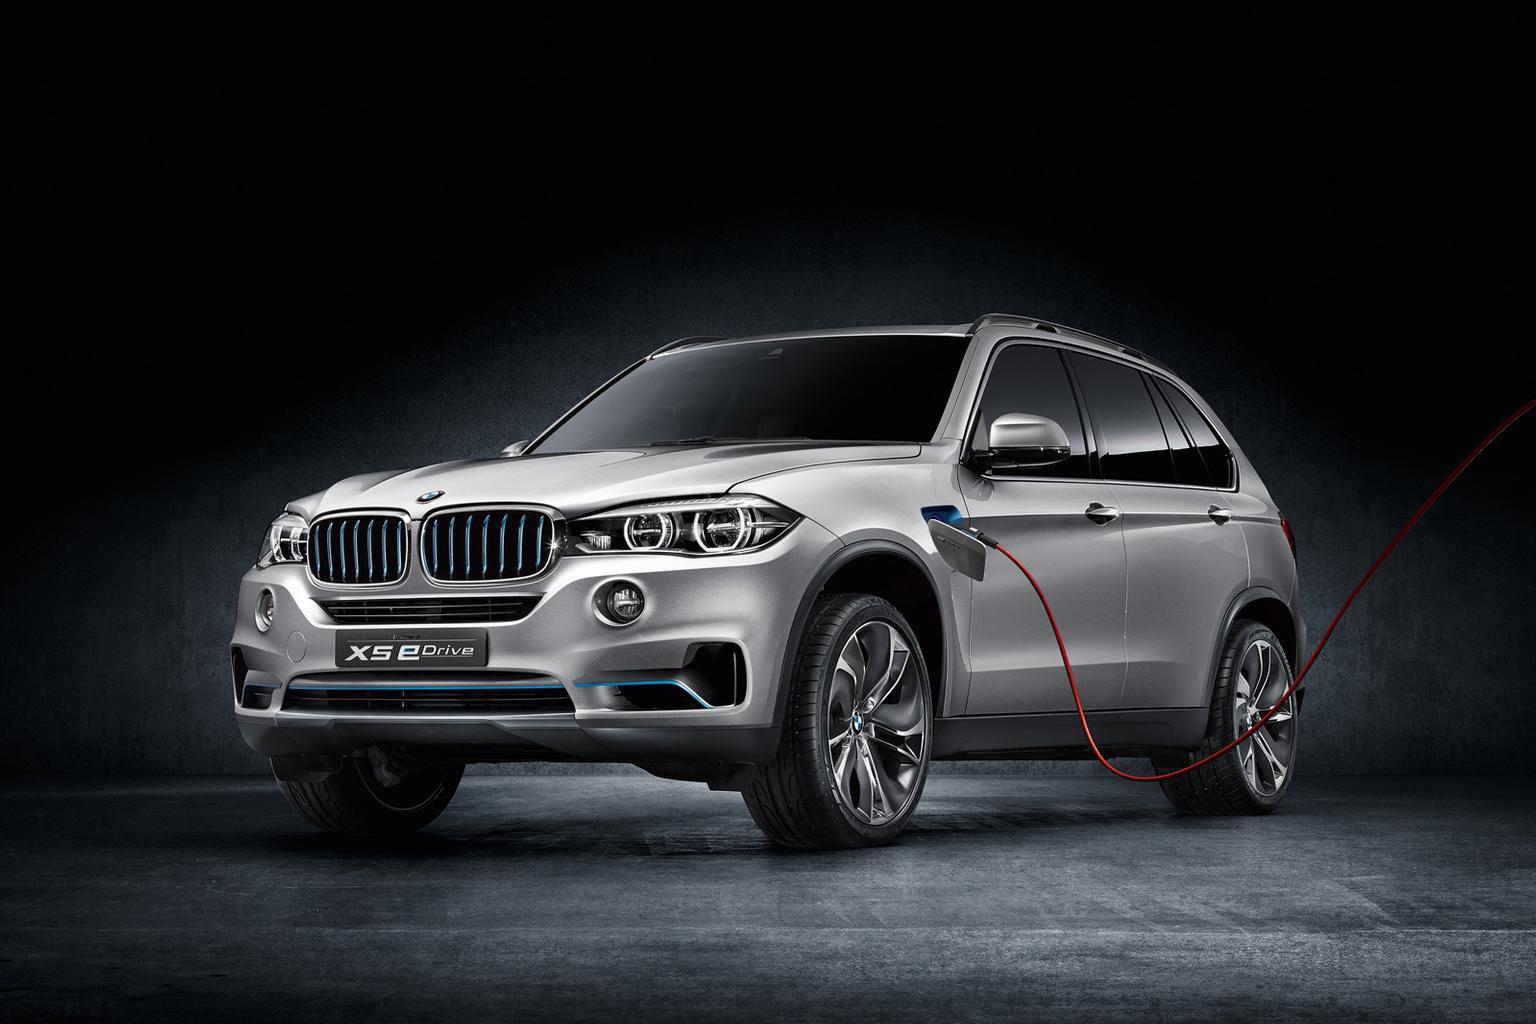 BMW X5 eDrive plug-in concept revealed